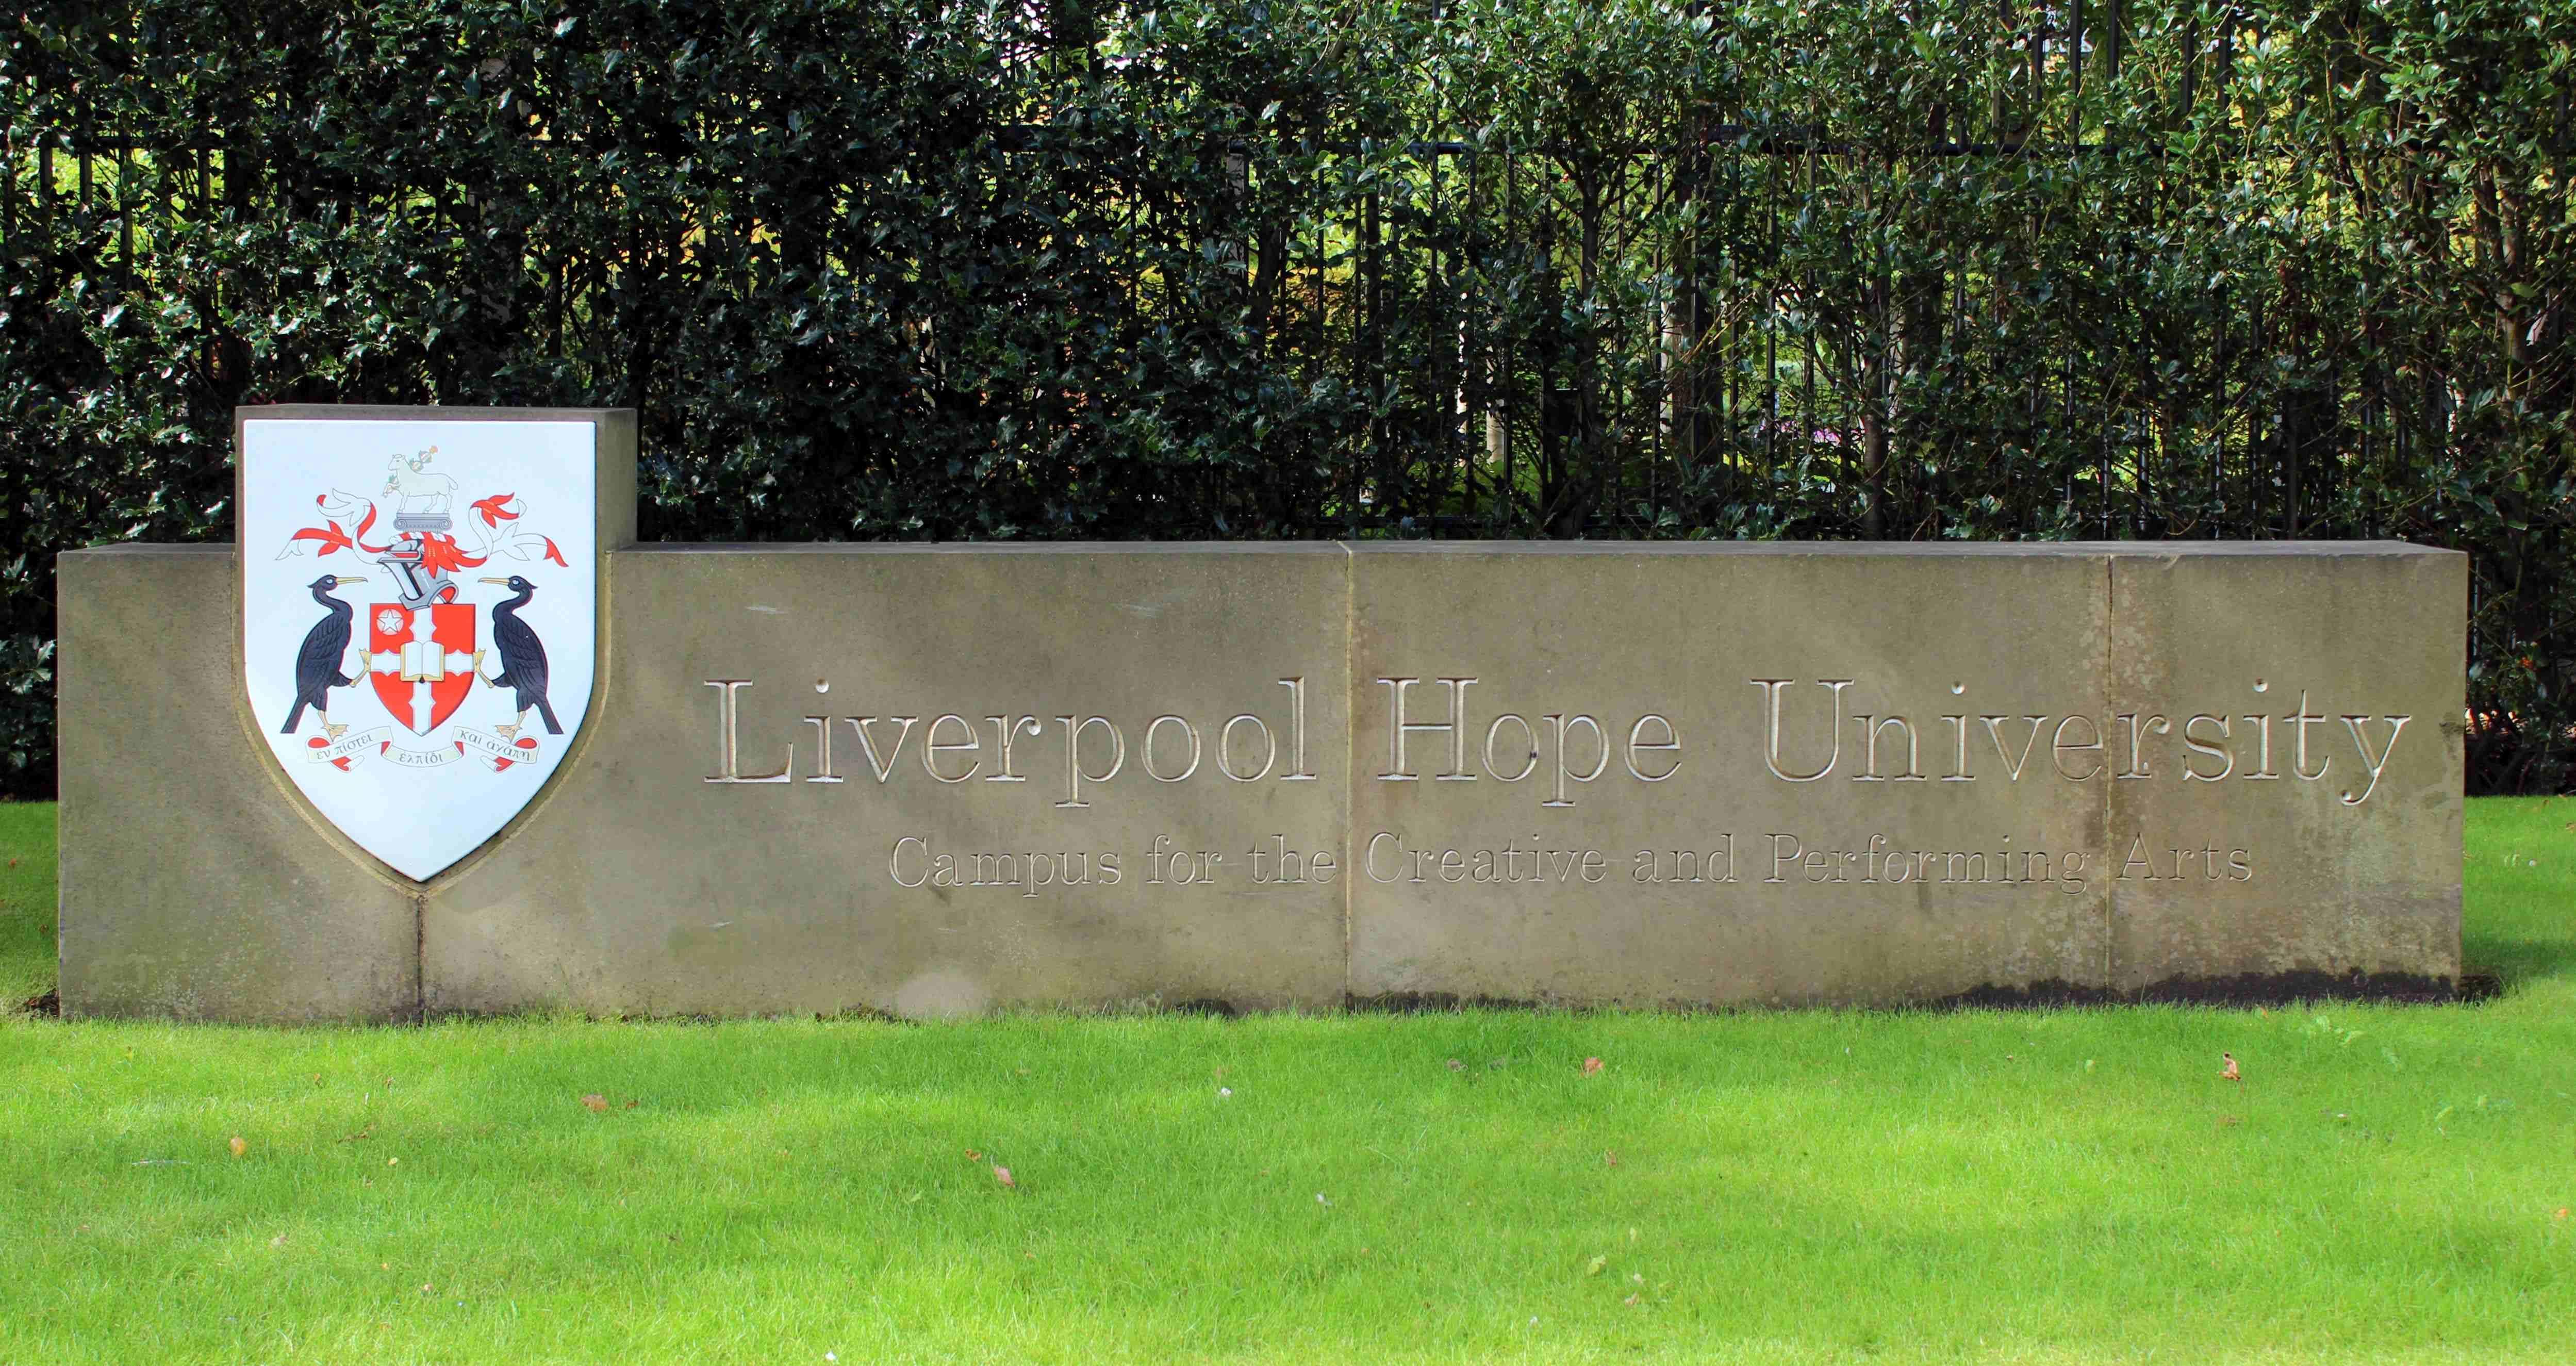 Liverpool_Hope_University_sign,_Shaw_Street